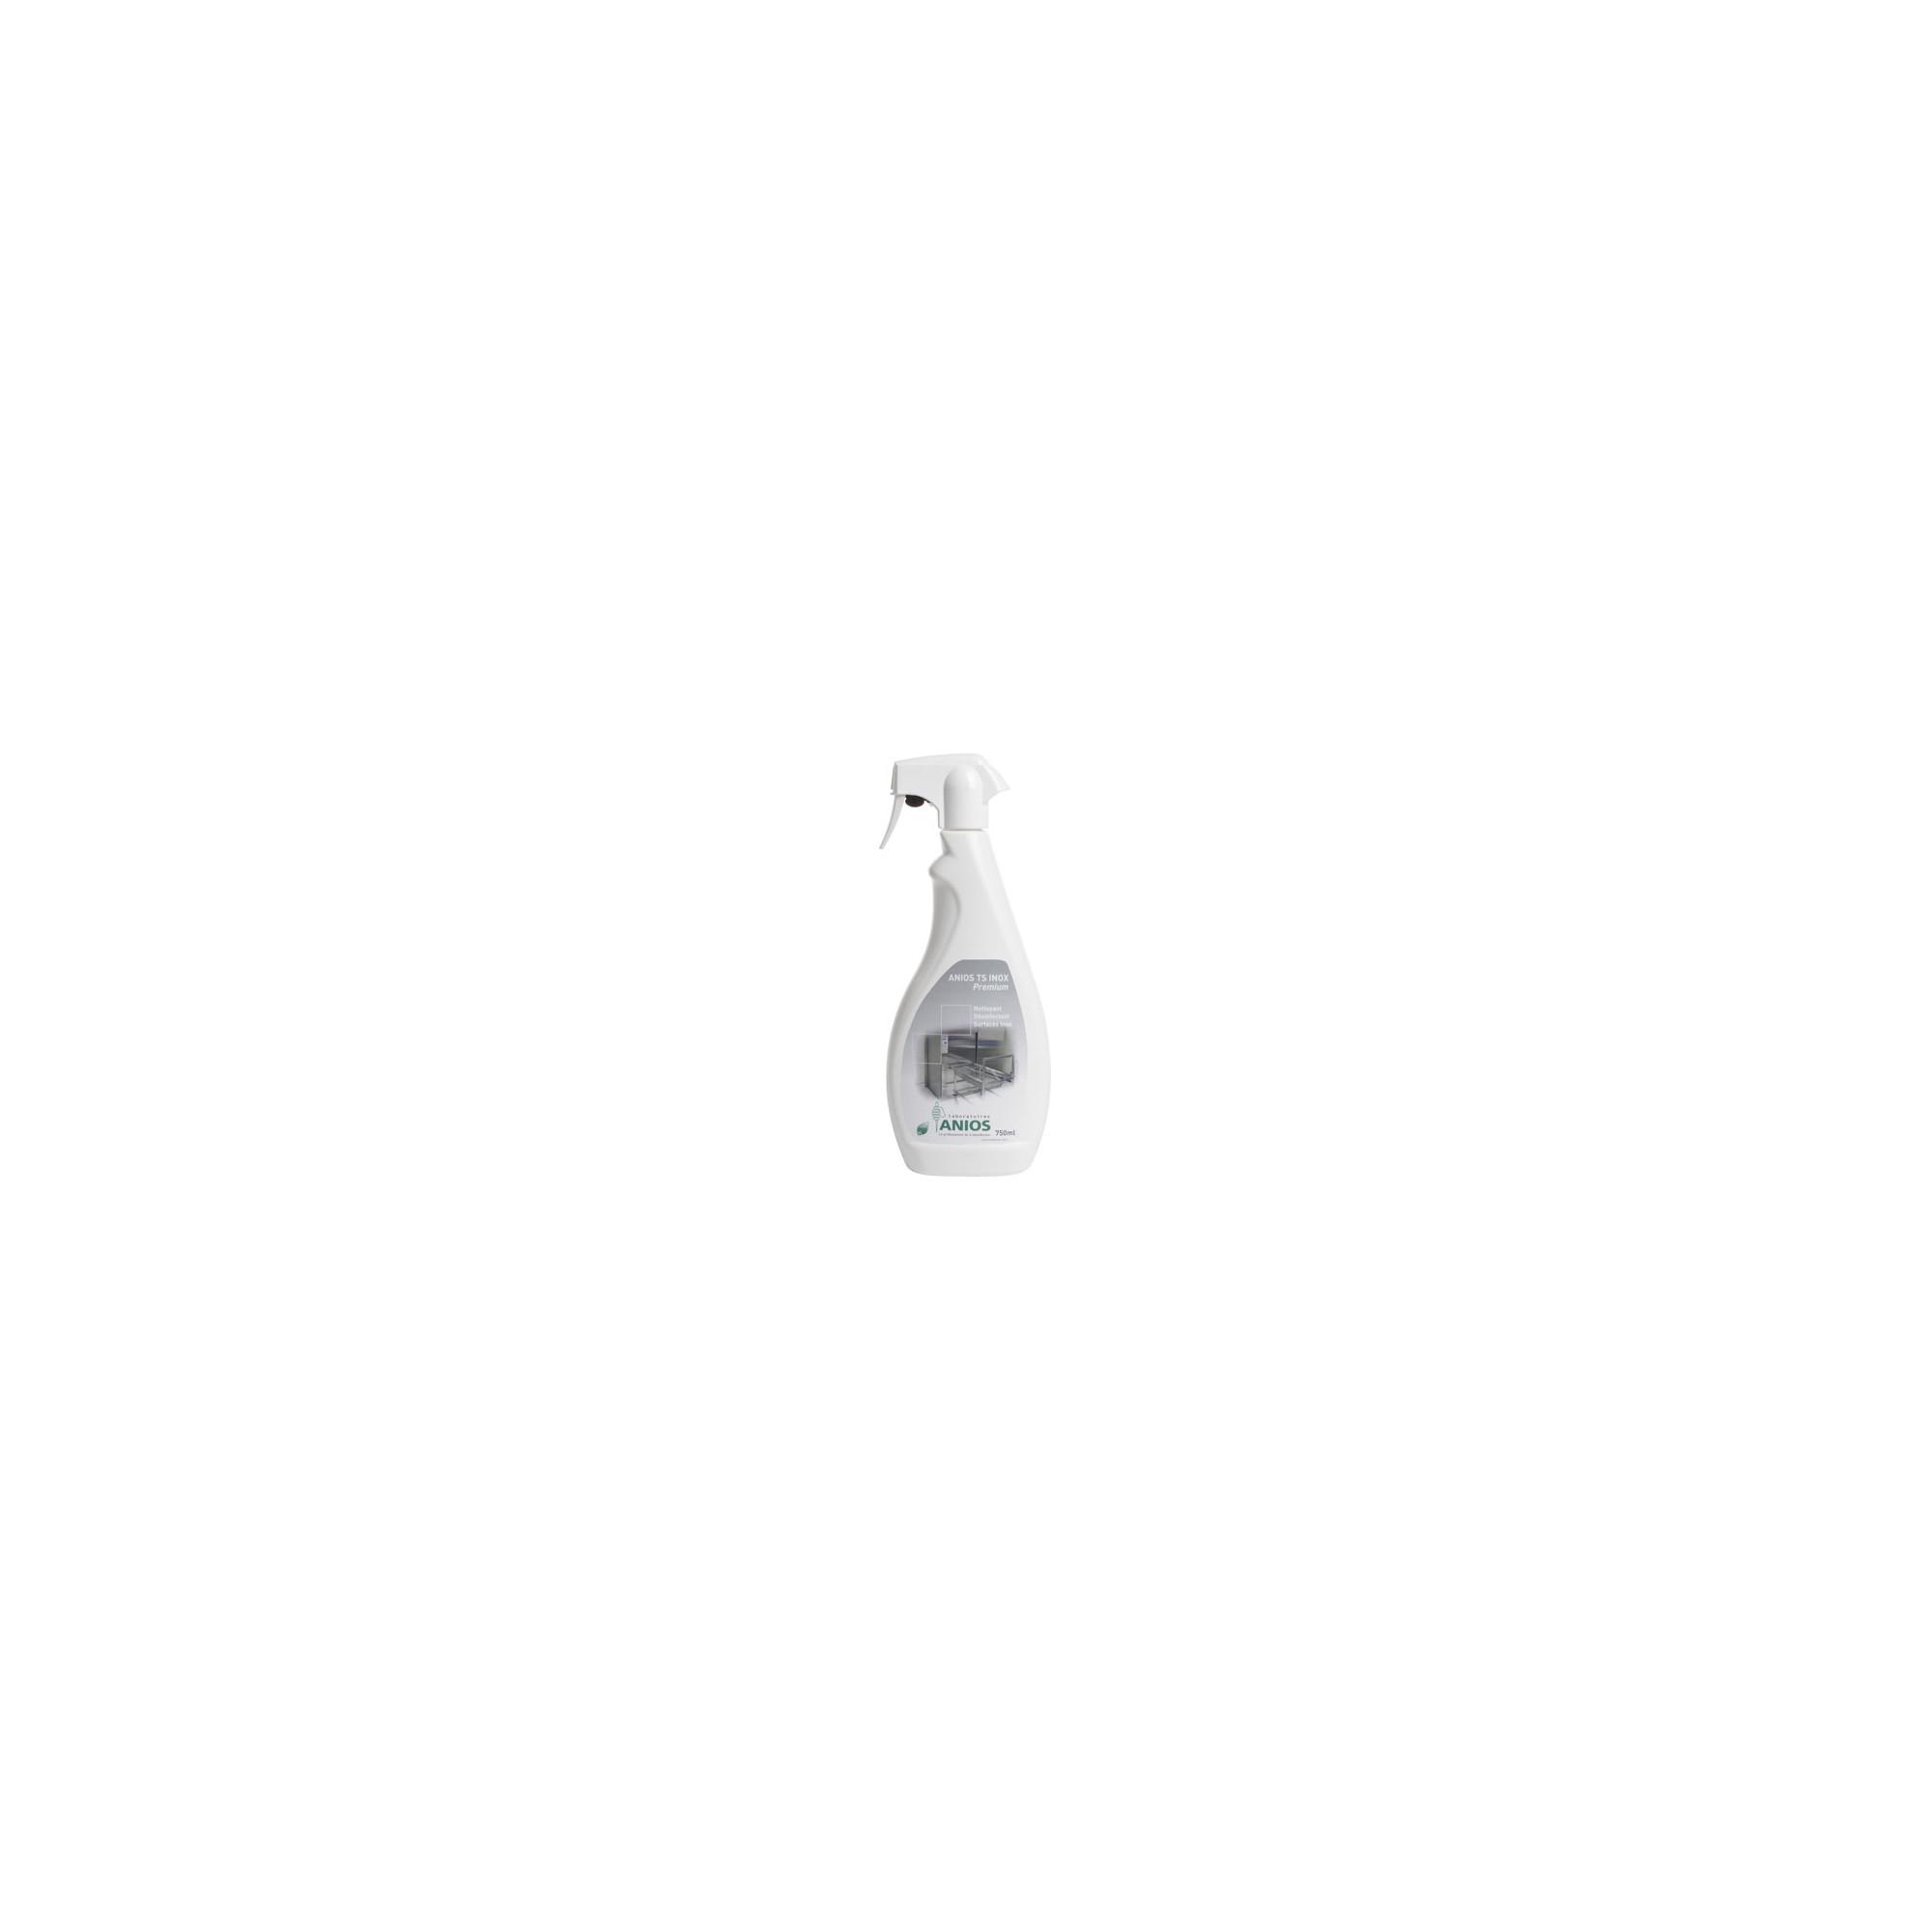 Anios TS Inox Premium - Nettoyant Désinfectant Surfaces Inox - 750mL